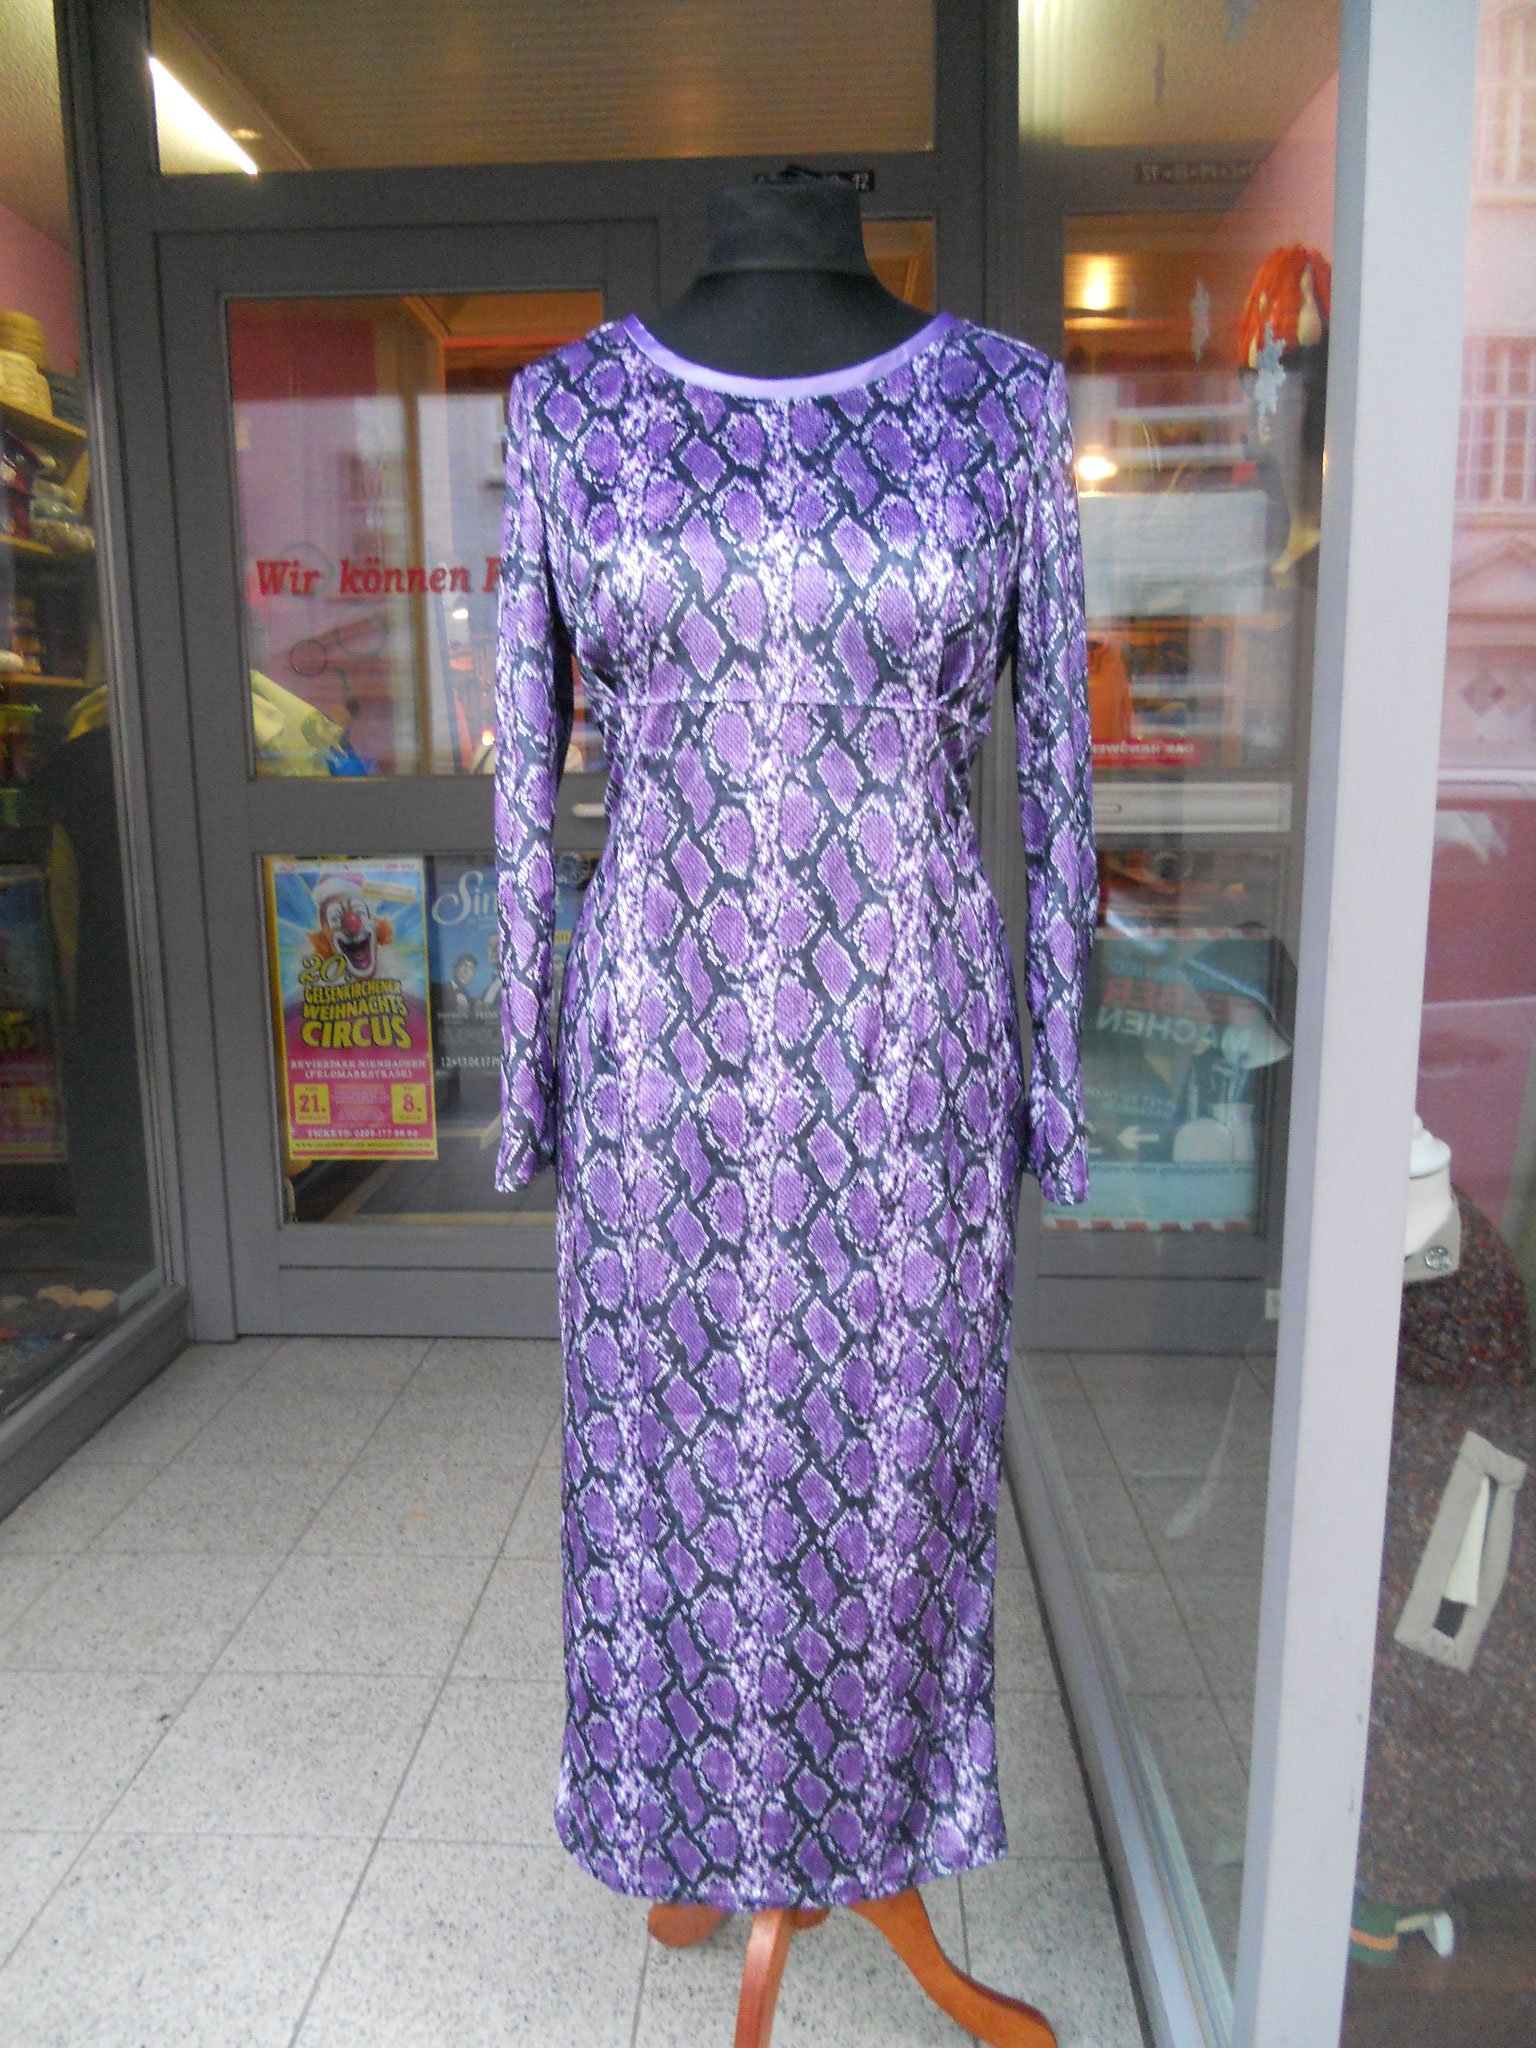 Schlangenkleid mit großer Kapuze, Gr. 42, Elasik-Pannésamt ungefüttert, 40€